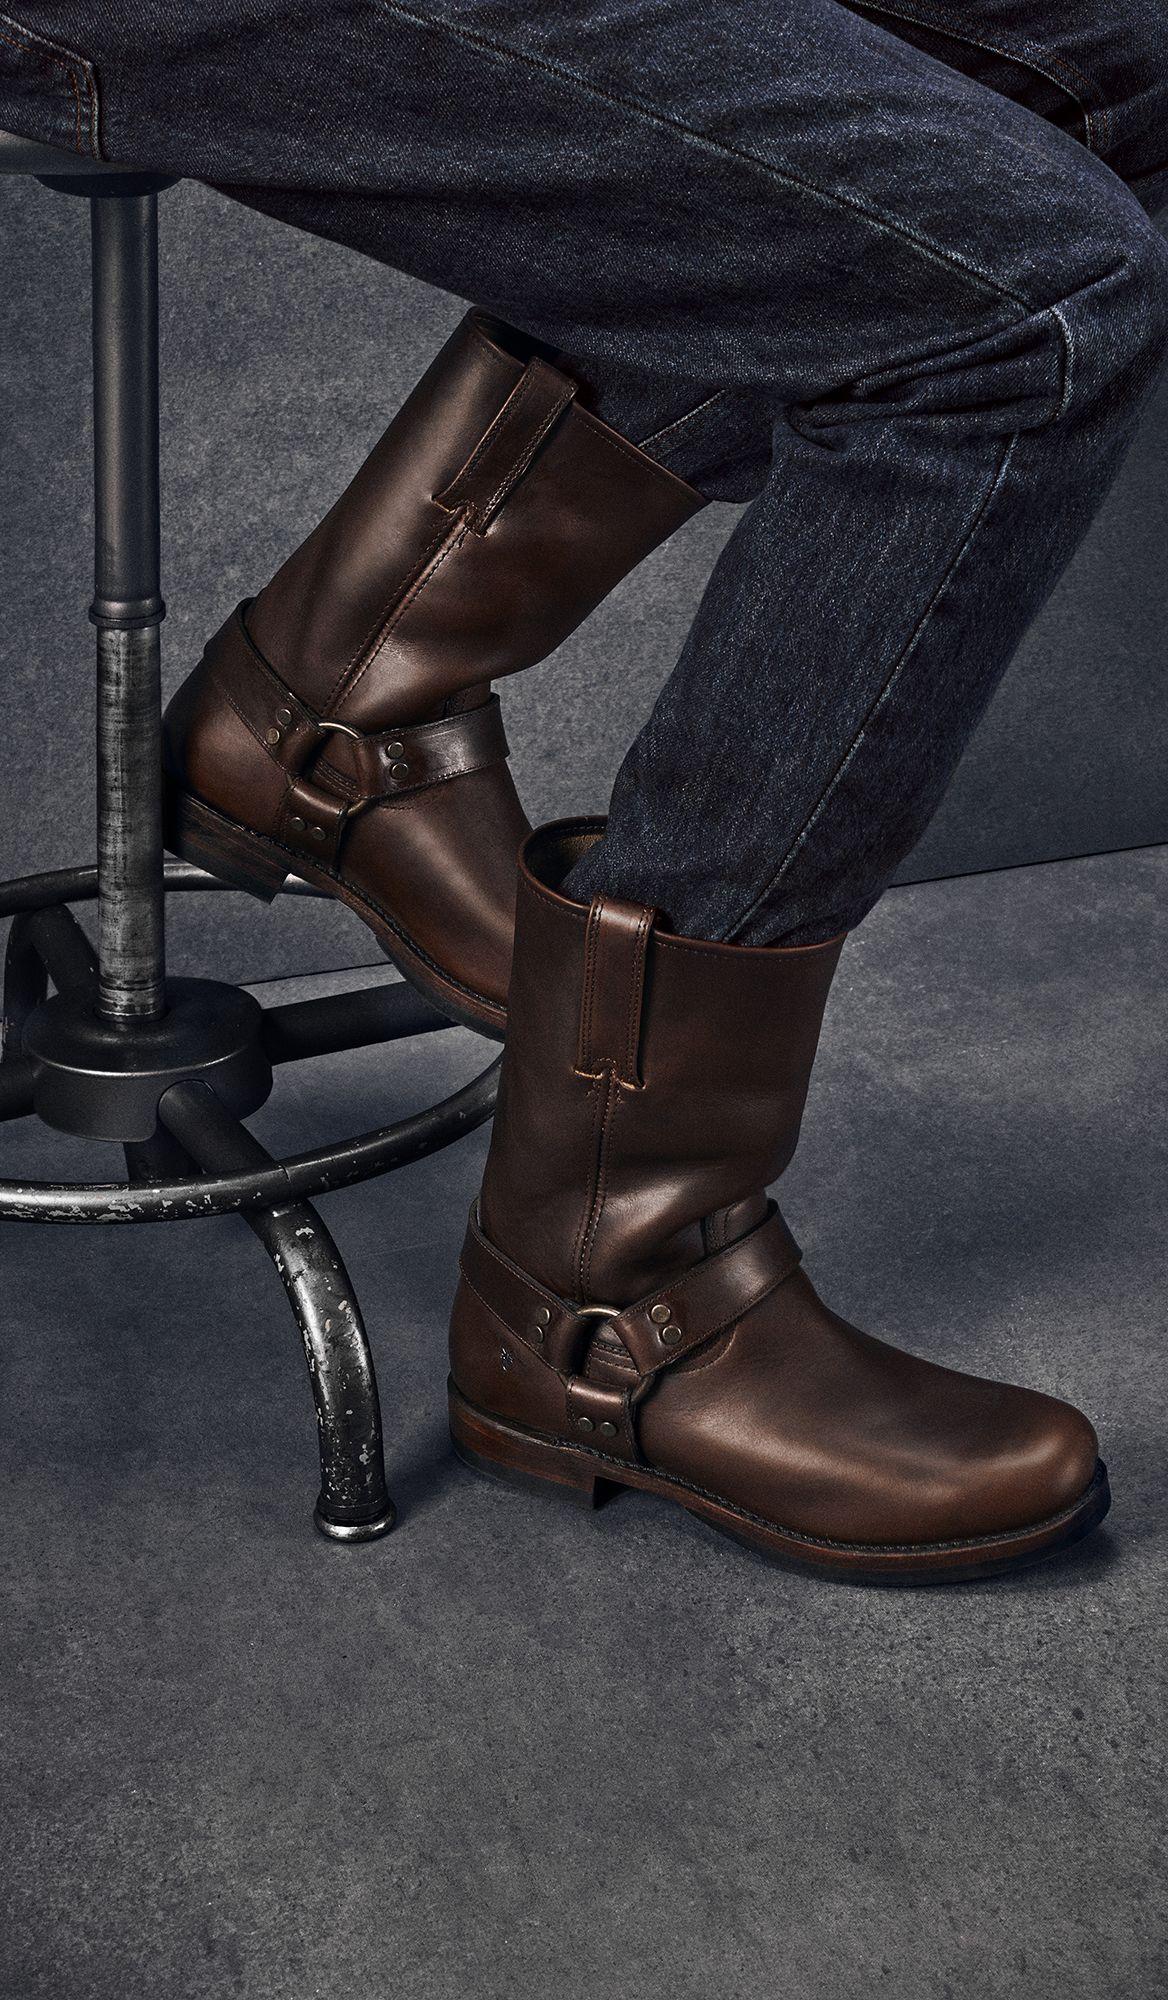 847e089d9b5 John Addison Harness Boots